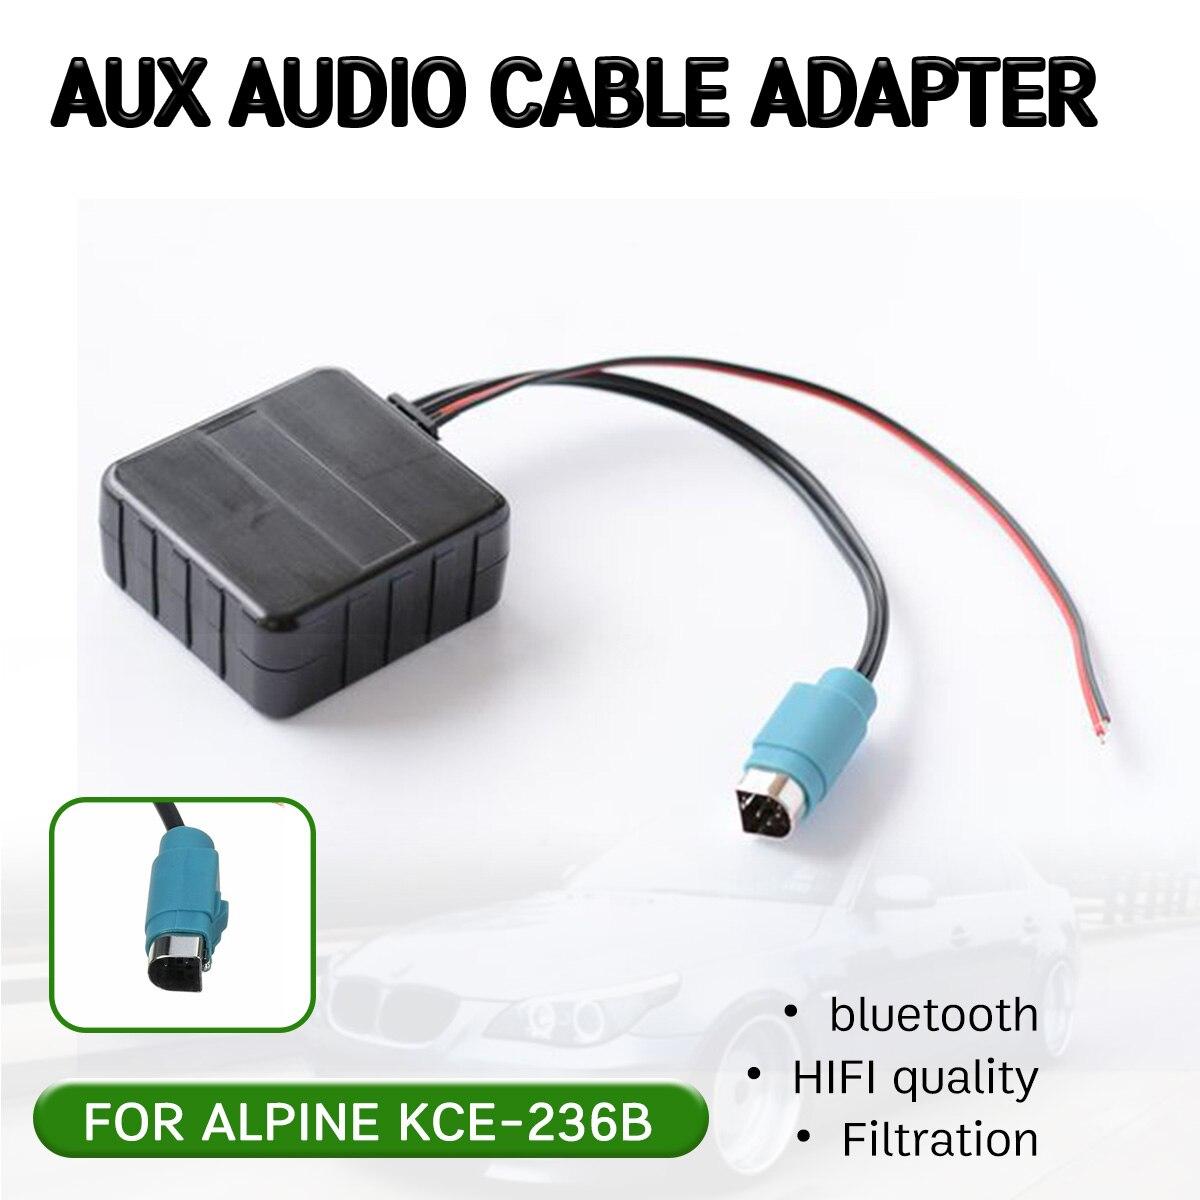 Adaptador de Cable receptor auxiliar bluetooth para Alpine CD Host KCE-236B 9870/9872 interfaz de entrada de música auxiliar de alta calidad